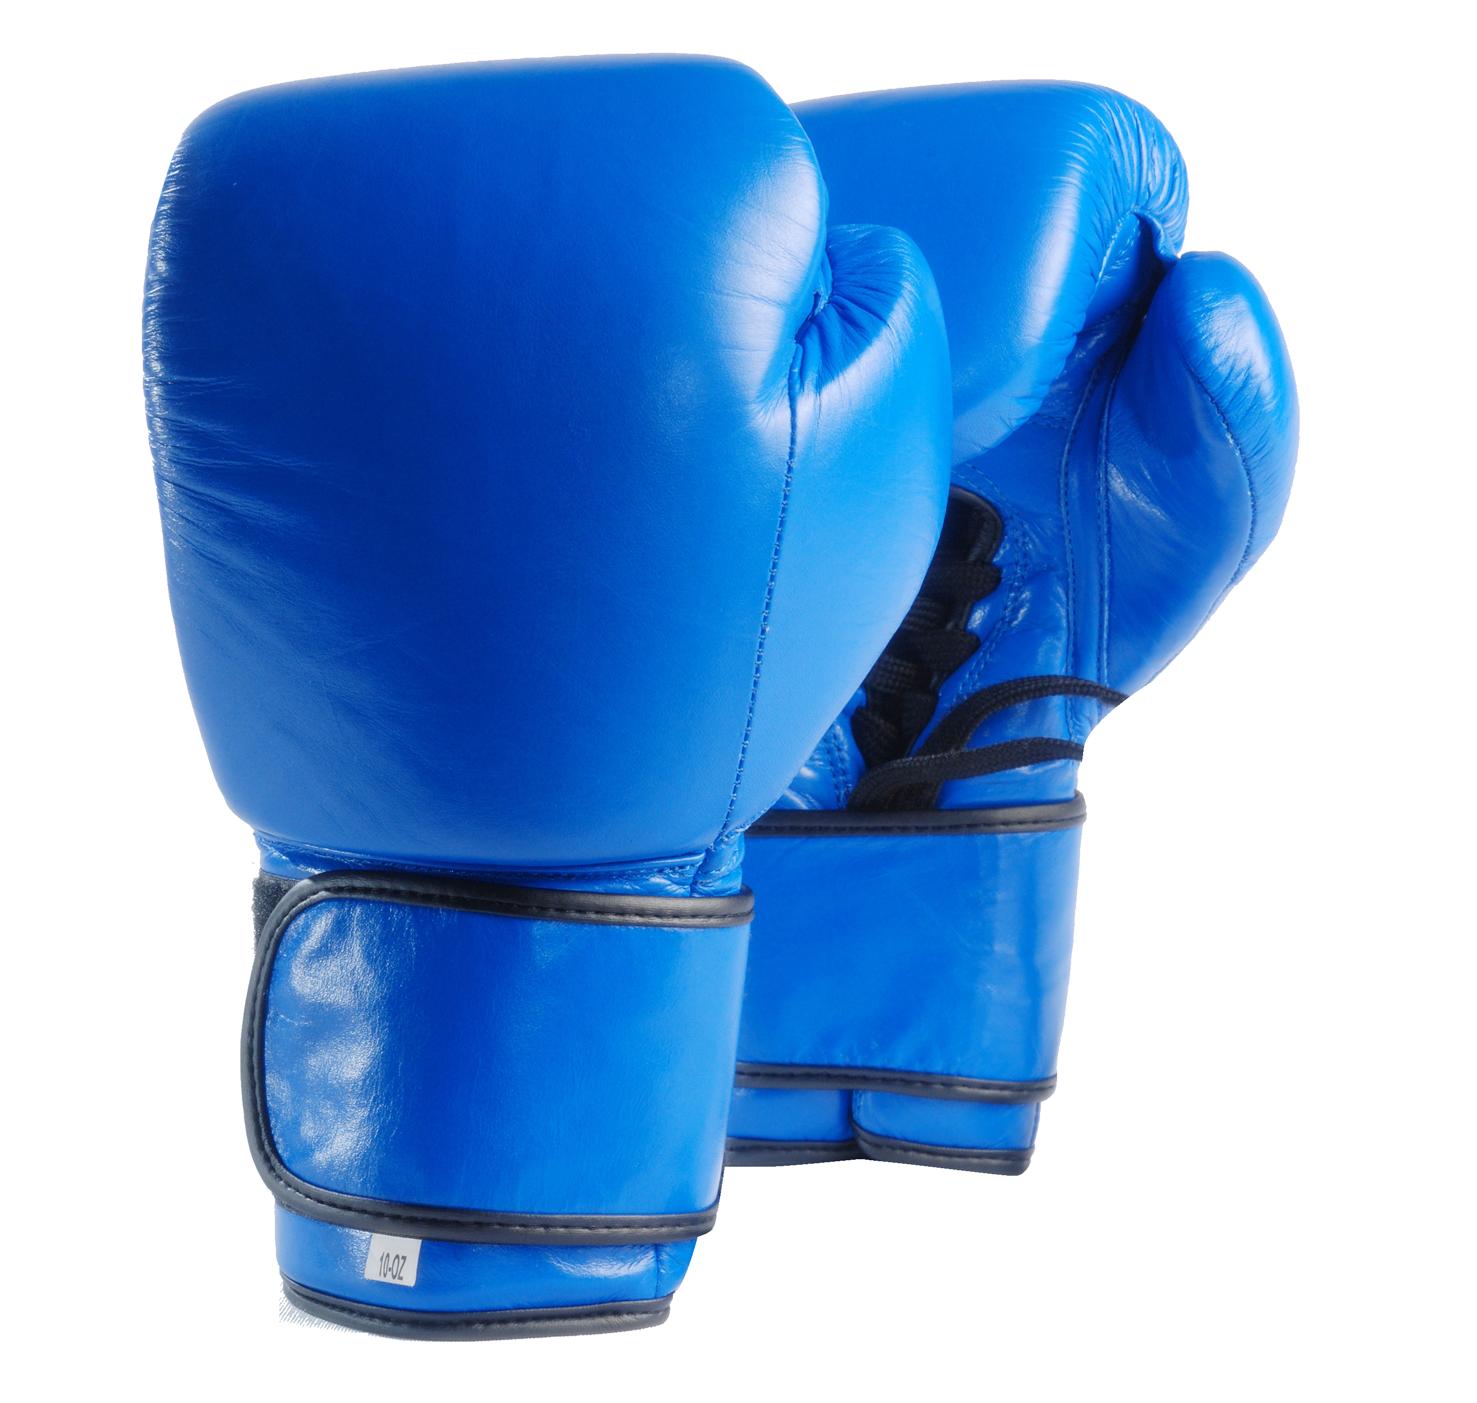 Boxing gloves png transparent. Glove clipart blue glove